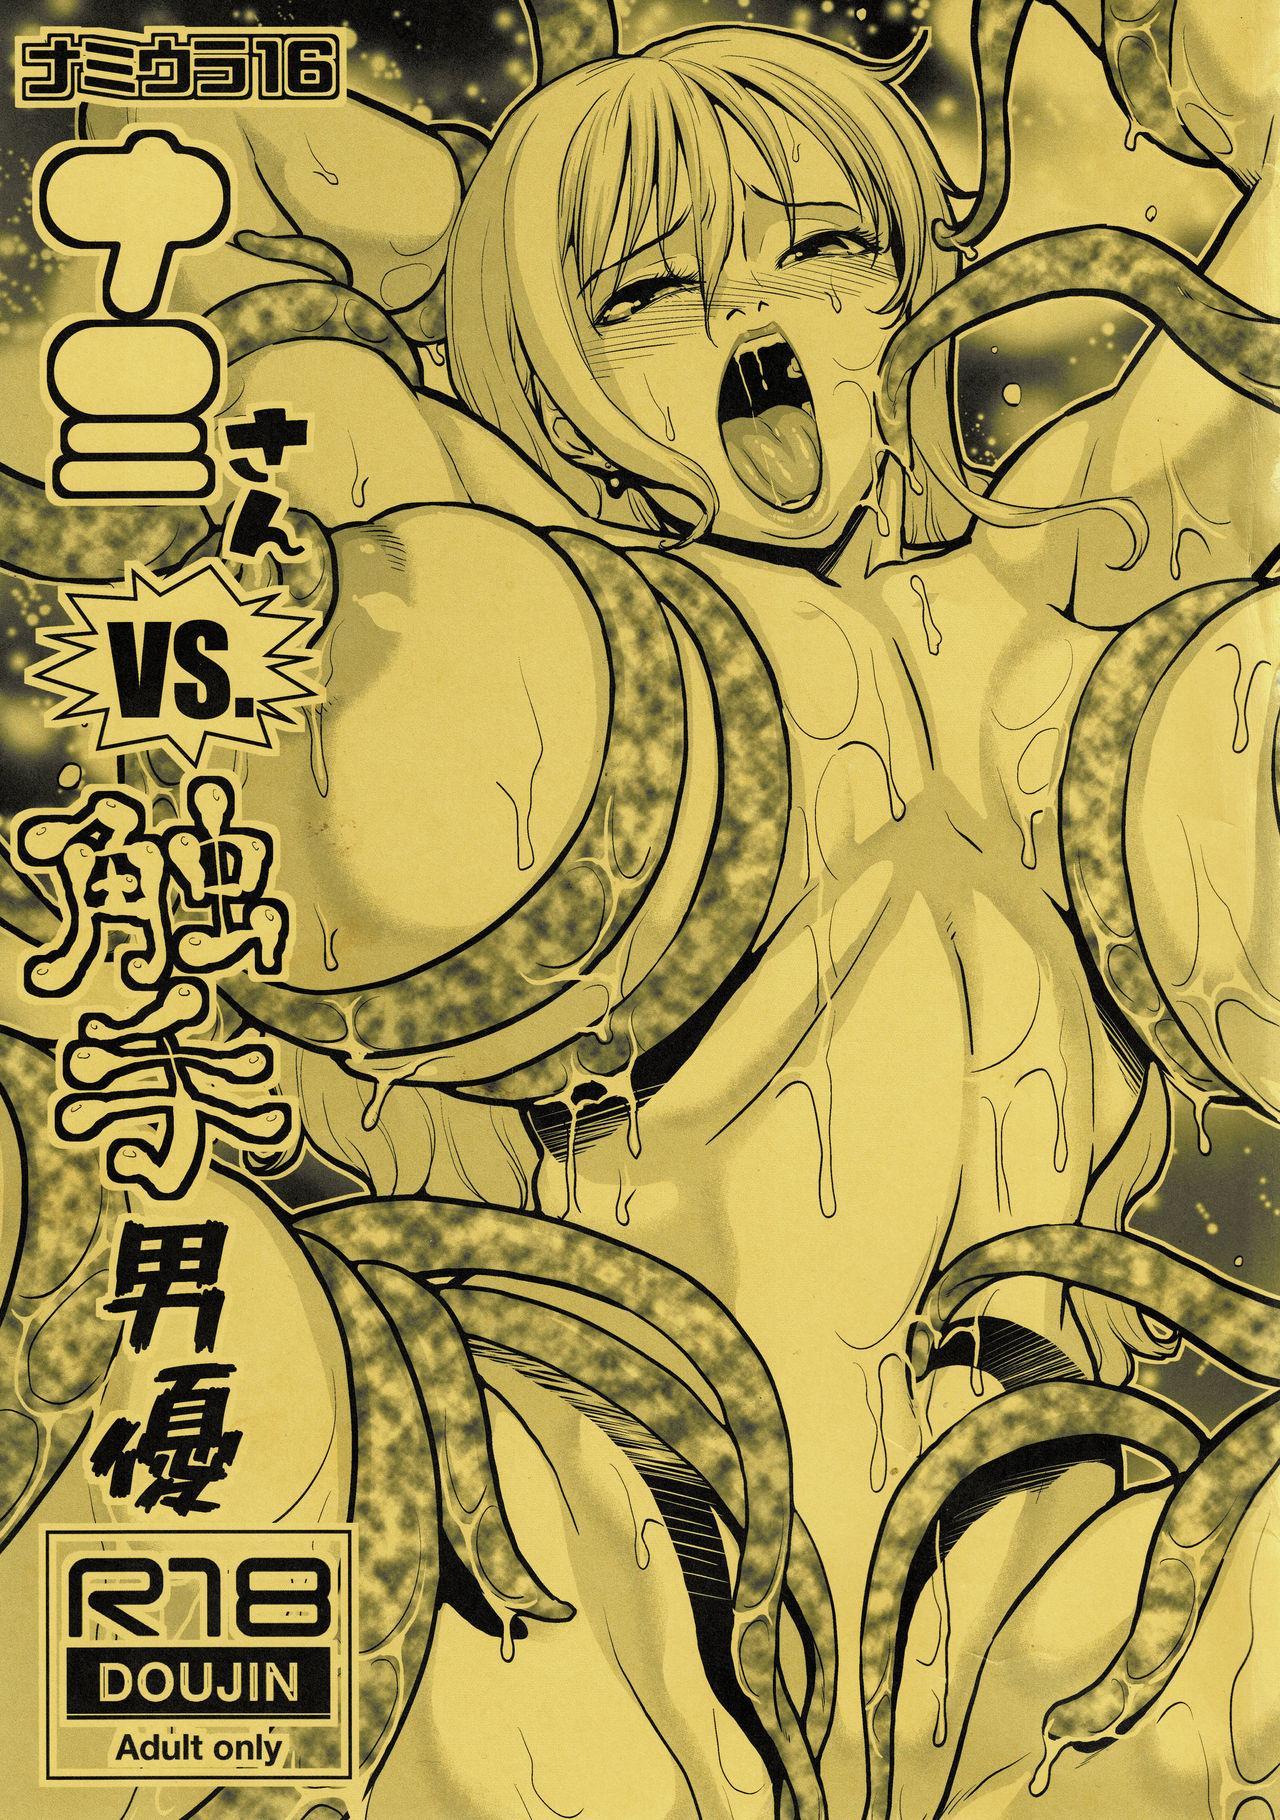 [ACID-HEAD (Murata.)] Nami Ura 16 Nami-san VS Shokushu Danyuu   Nami Hidden 16 - Nami-san VS The Tentacle Man (One Piece) [English] {Doujins.com} 0